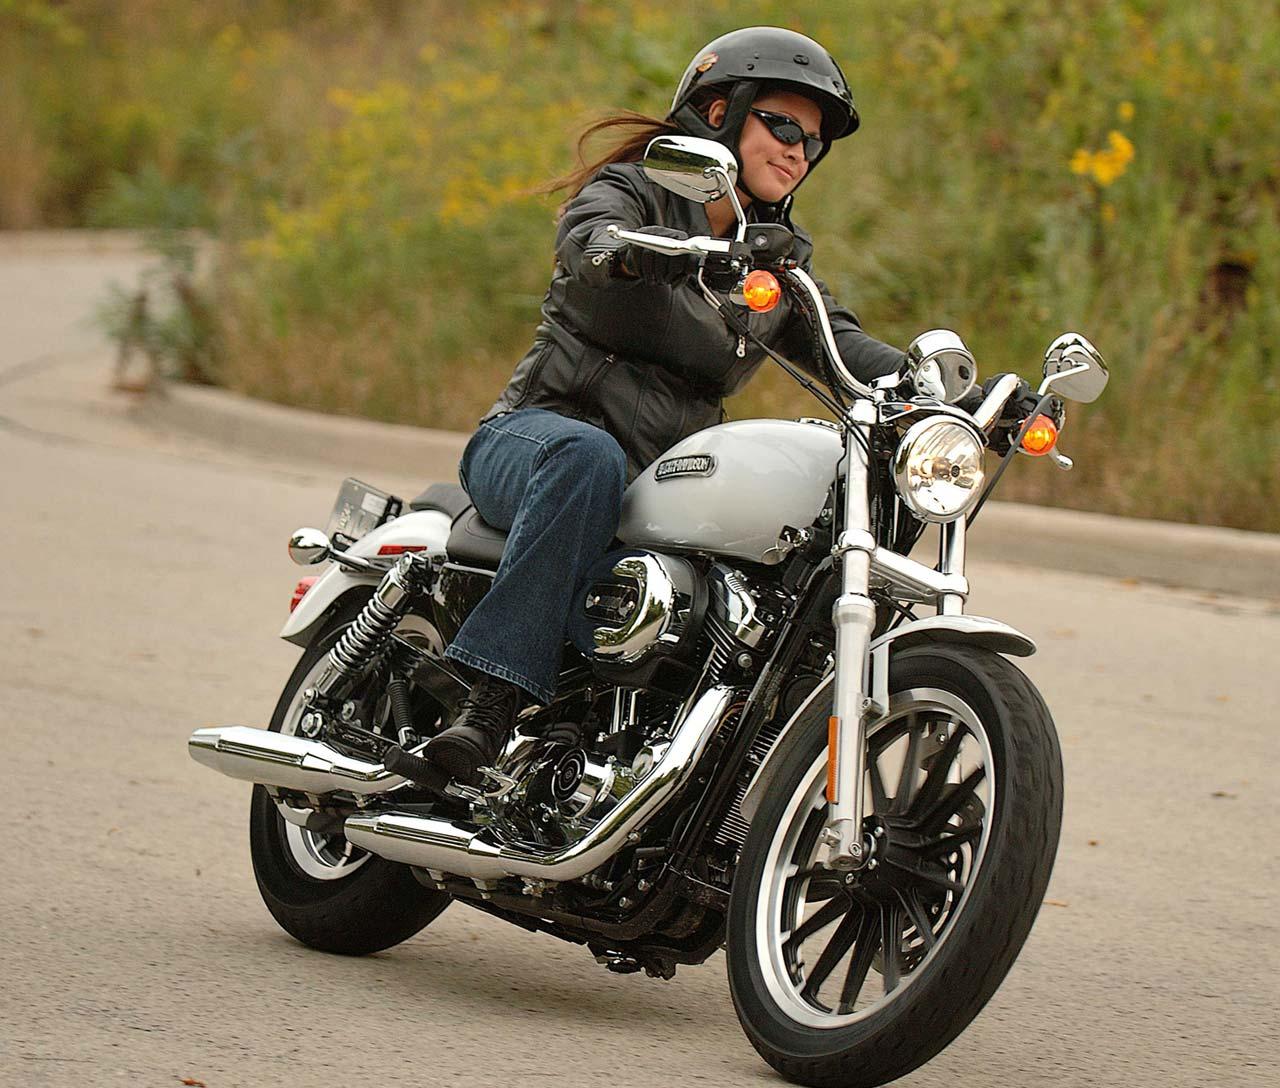 Harley-Davidson: 2007 Harley Davidson XL1200L Sportster Low